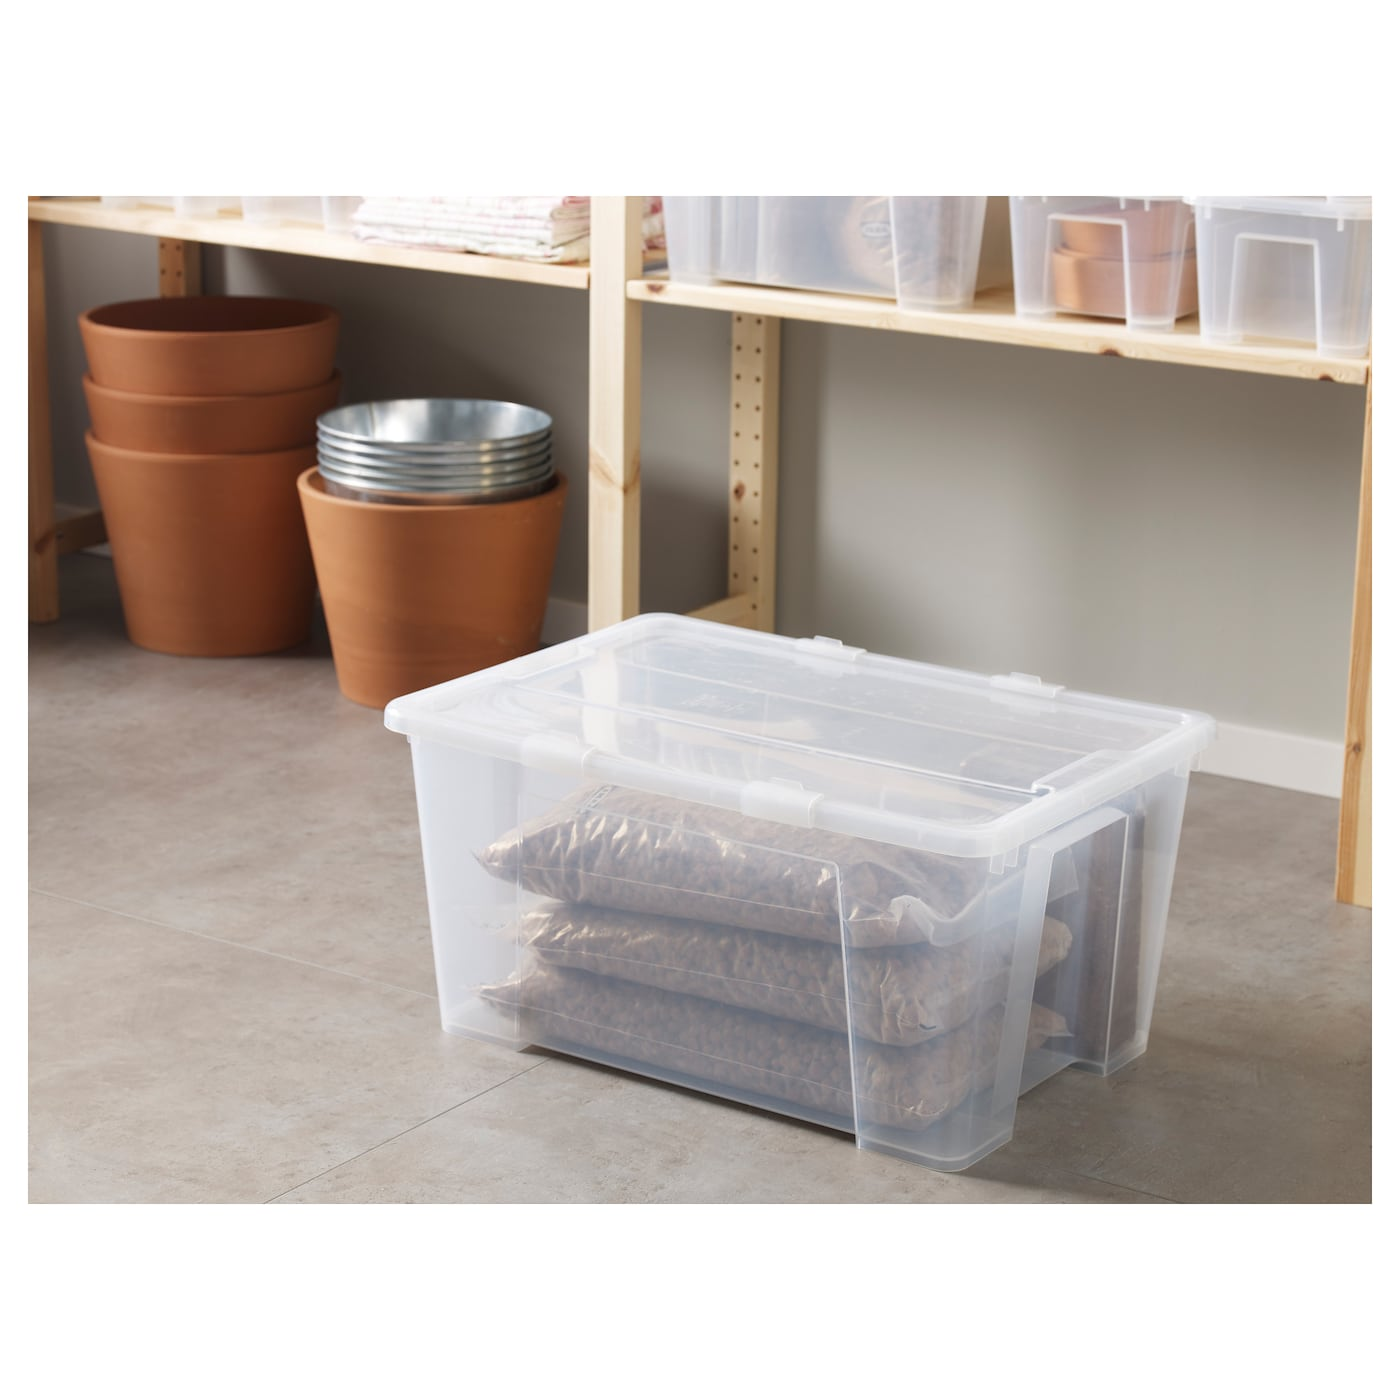 SAMLA Bak met deksel, transparant, 57x39x28 cm/45 l